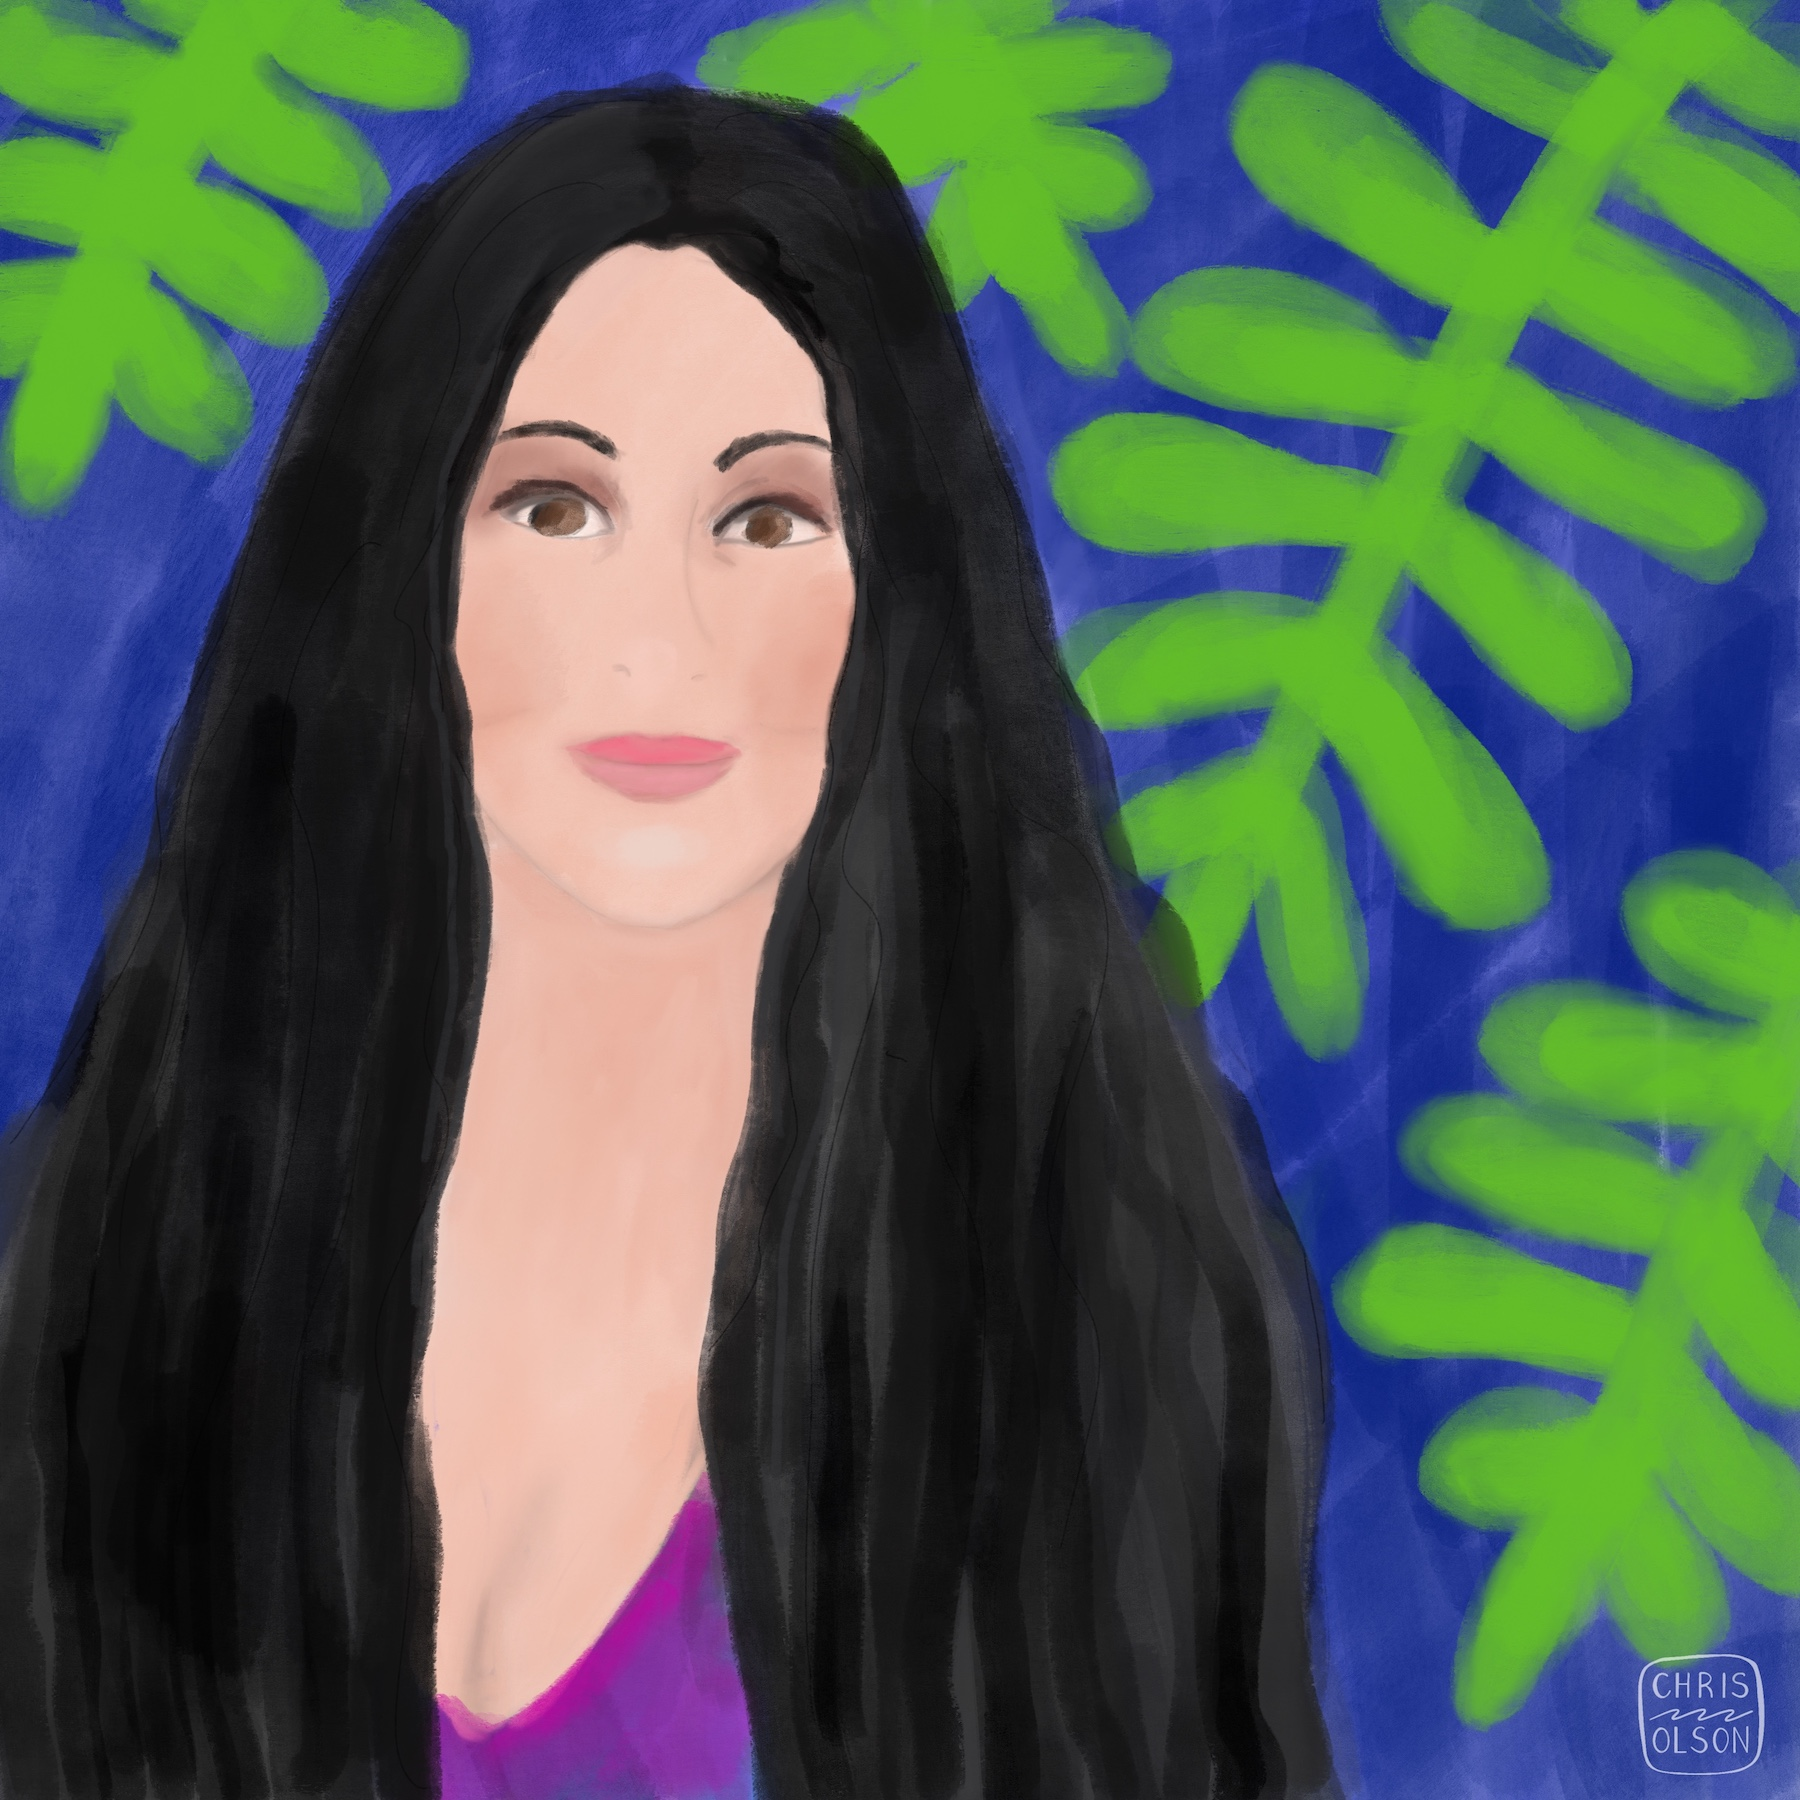 Cher portrait by Chris Olson